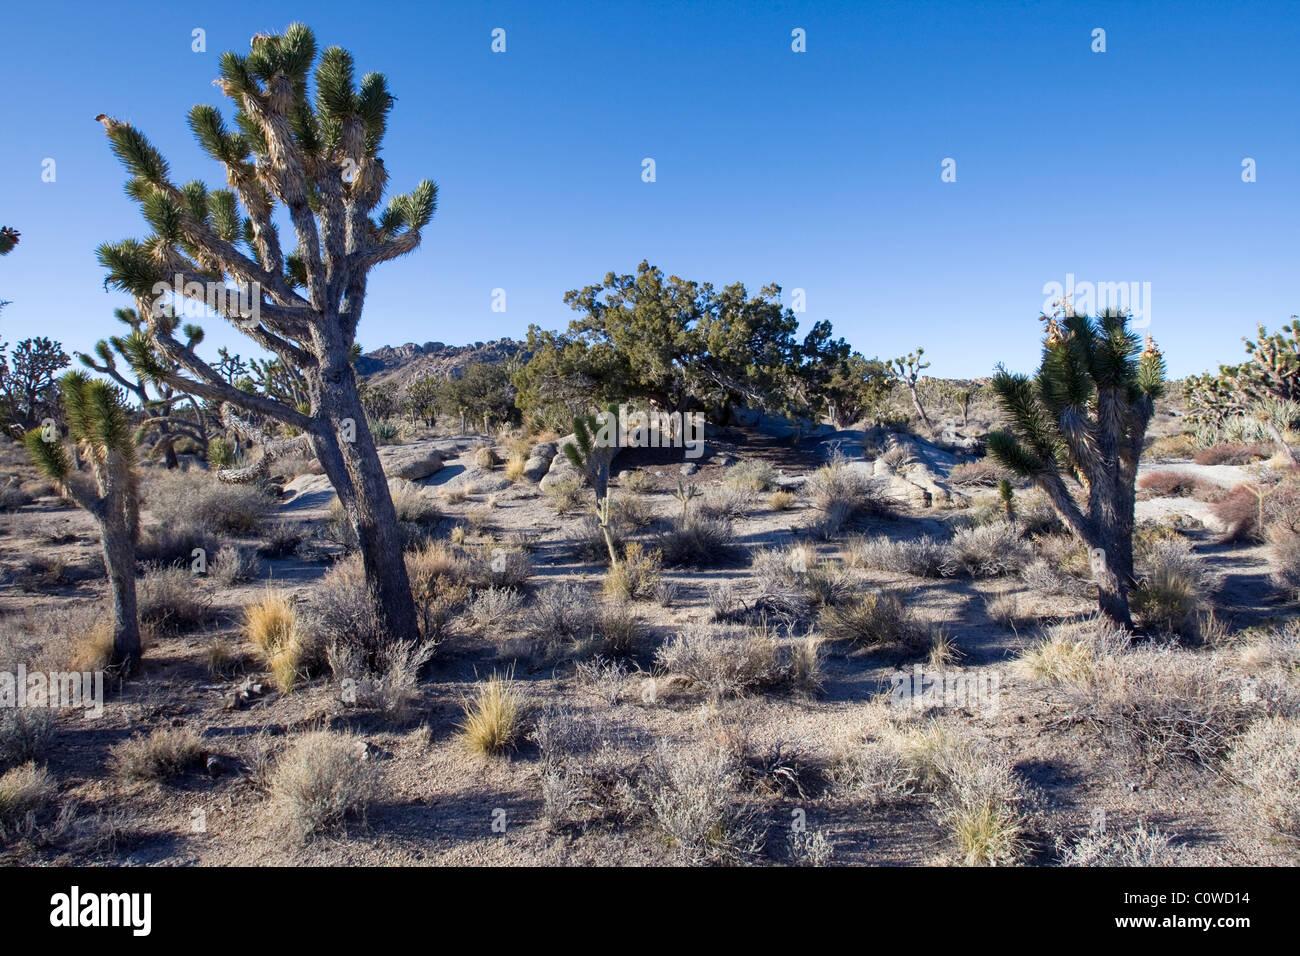 Joshua tree (Yucca brevifolia) in the Mojave Desert, California. - Stock Image